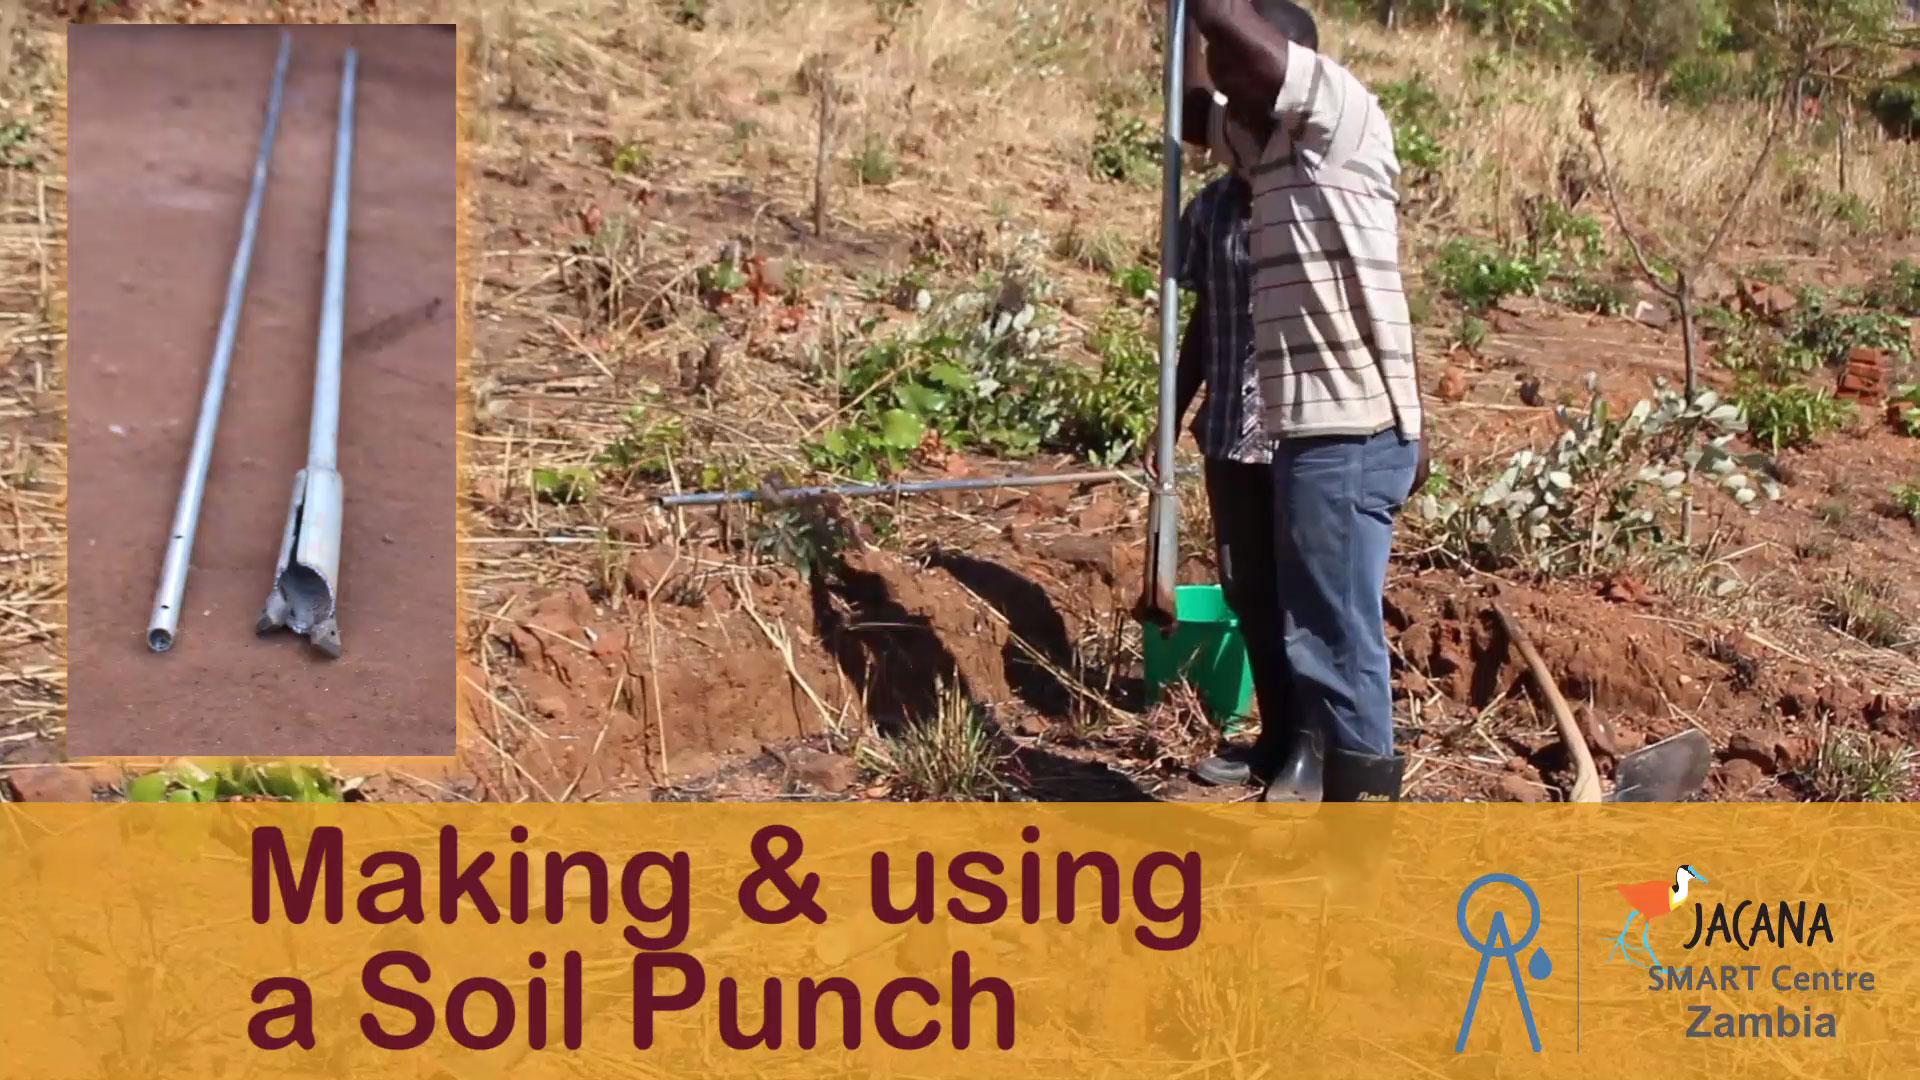 Making a Soil punch